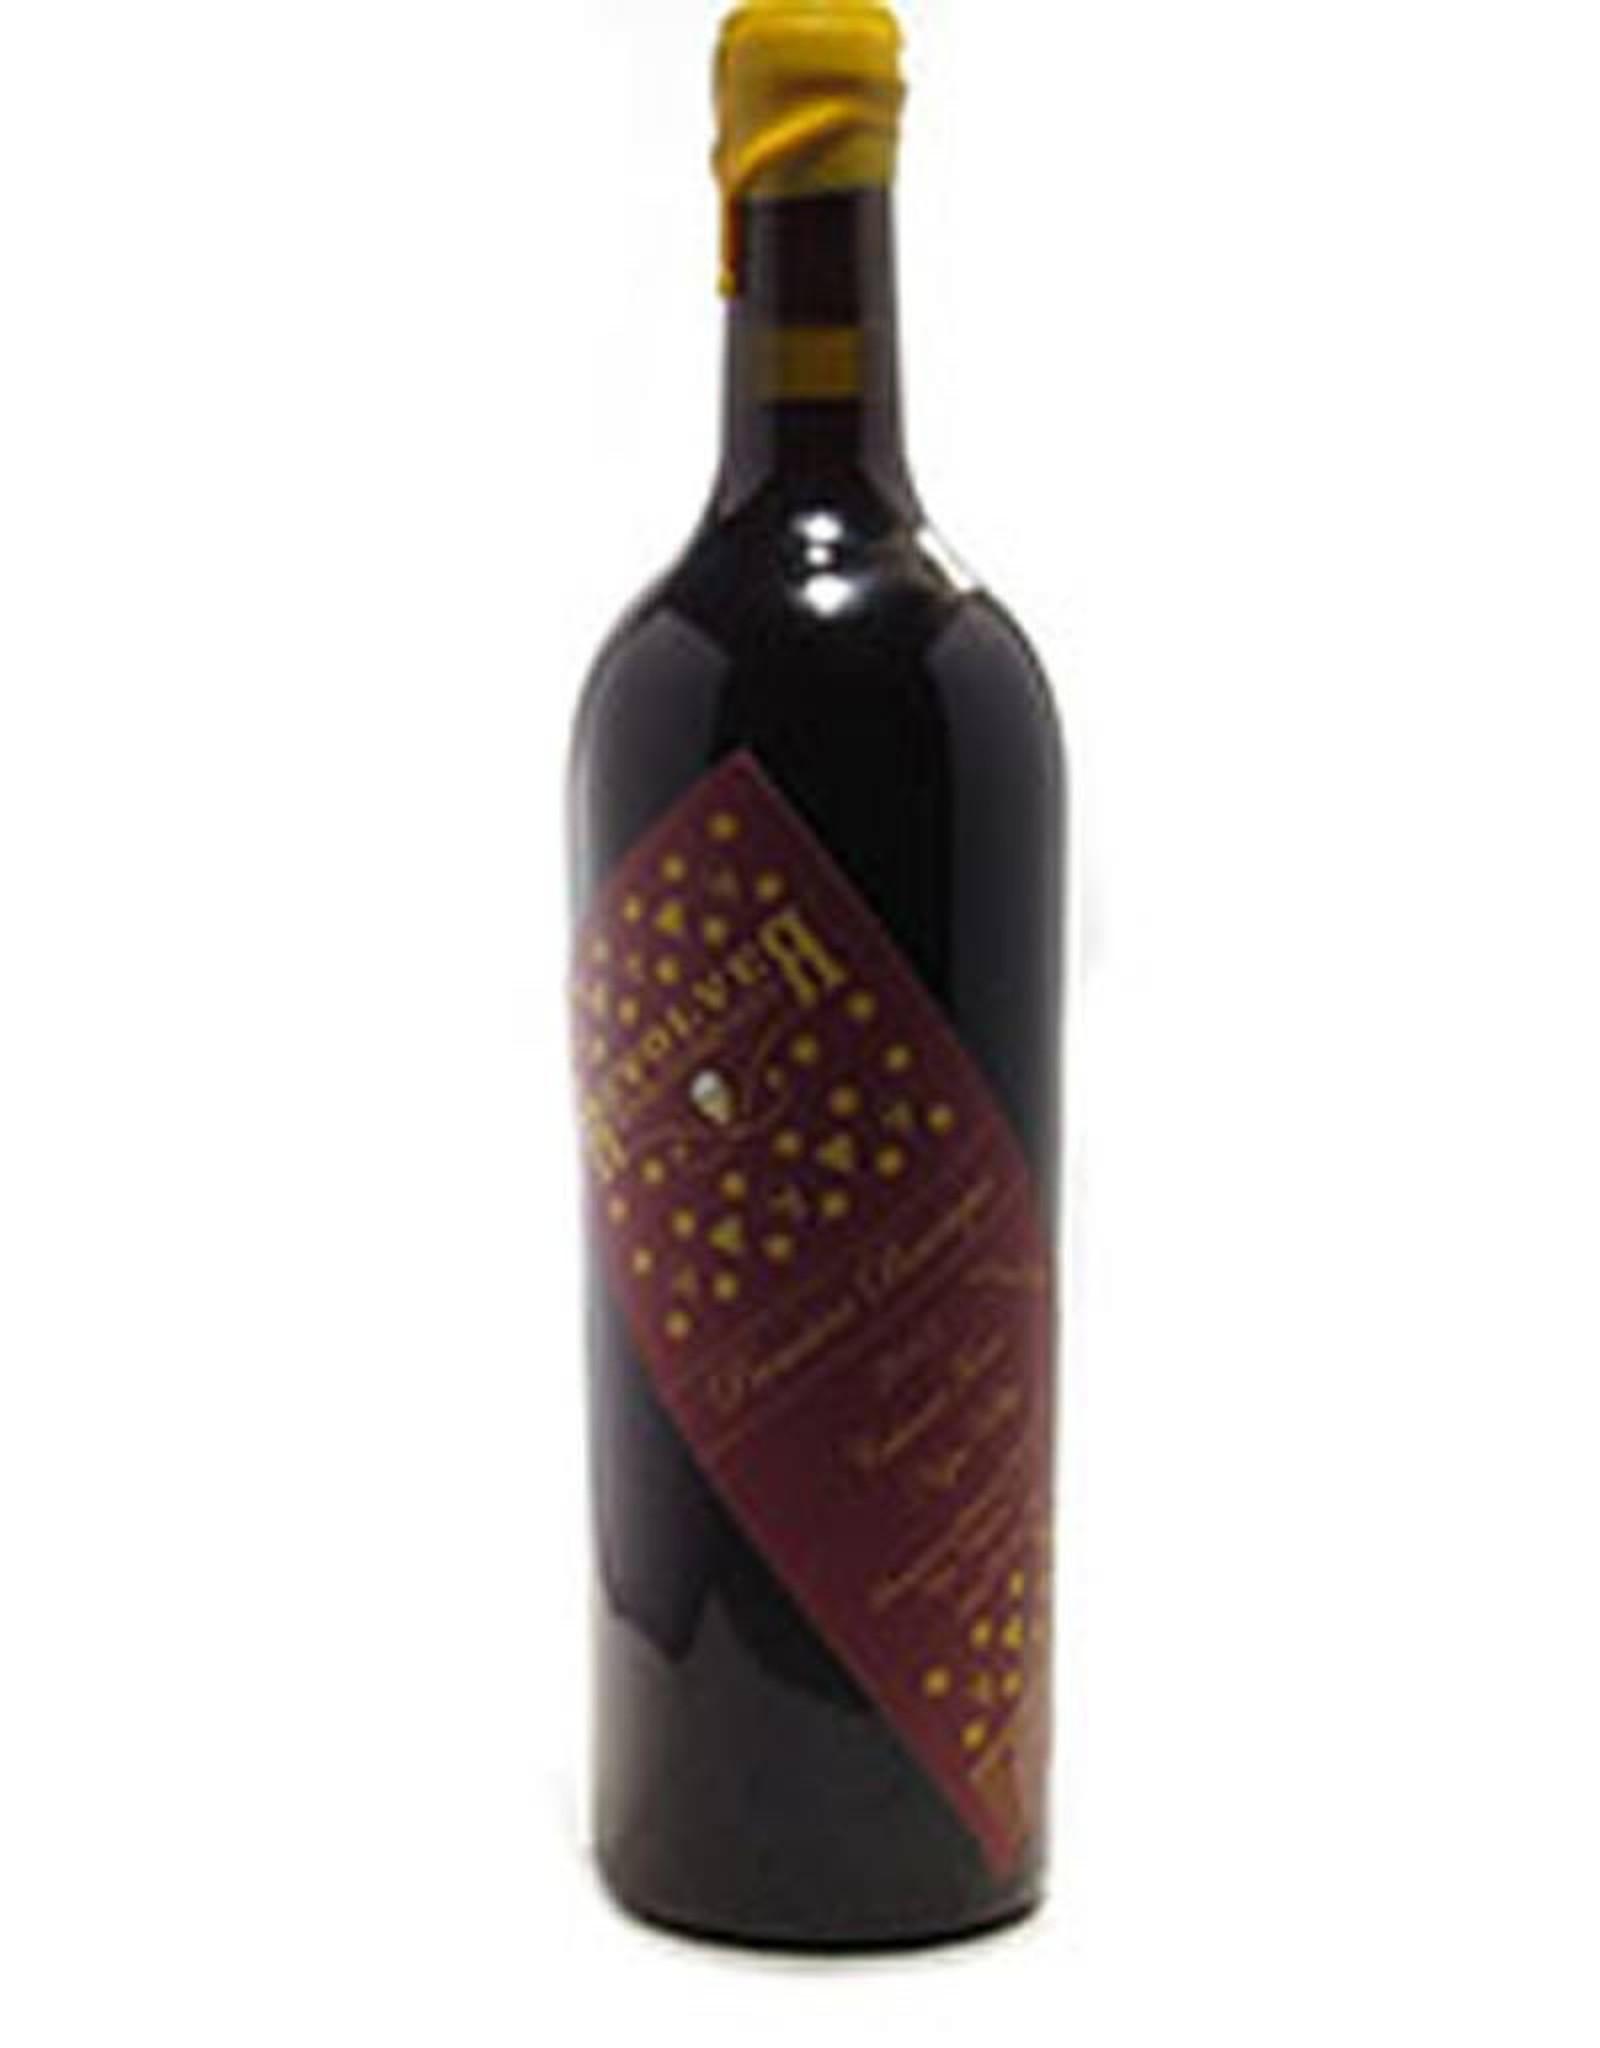 Red Wine 2014, Revolver Wine Co. Premiere Barrique, Cabernet Franc, Yountville, Napa Valley, California, 15.2% Alc,